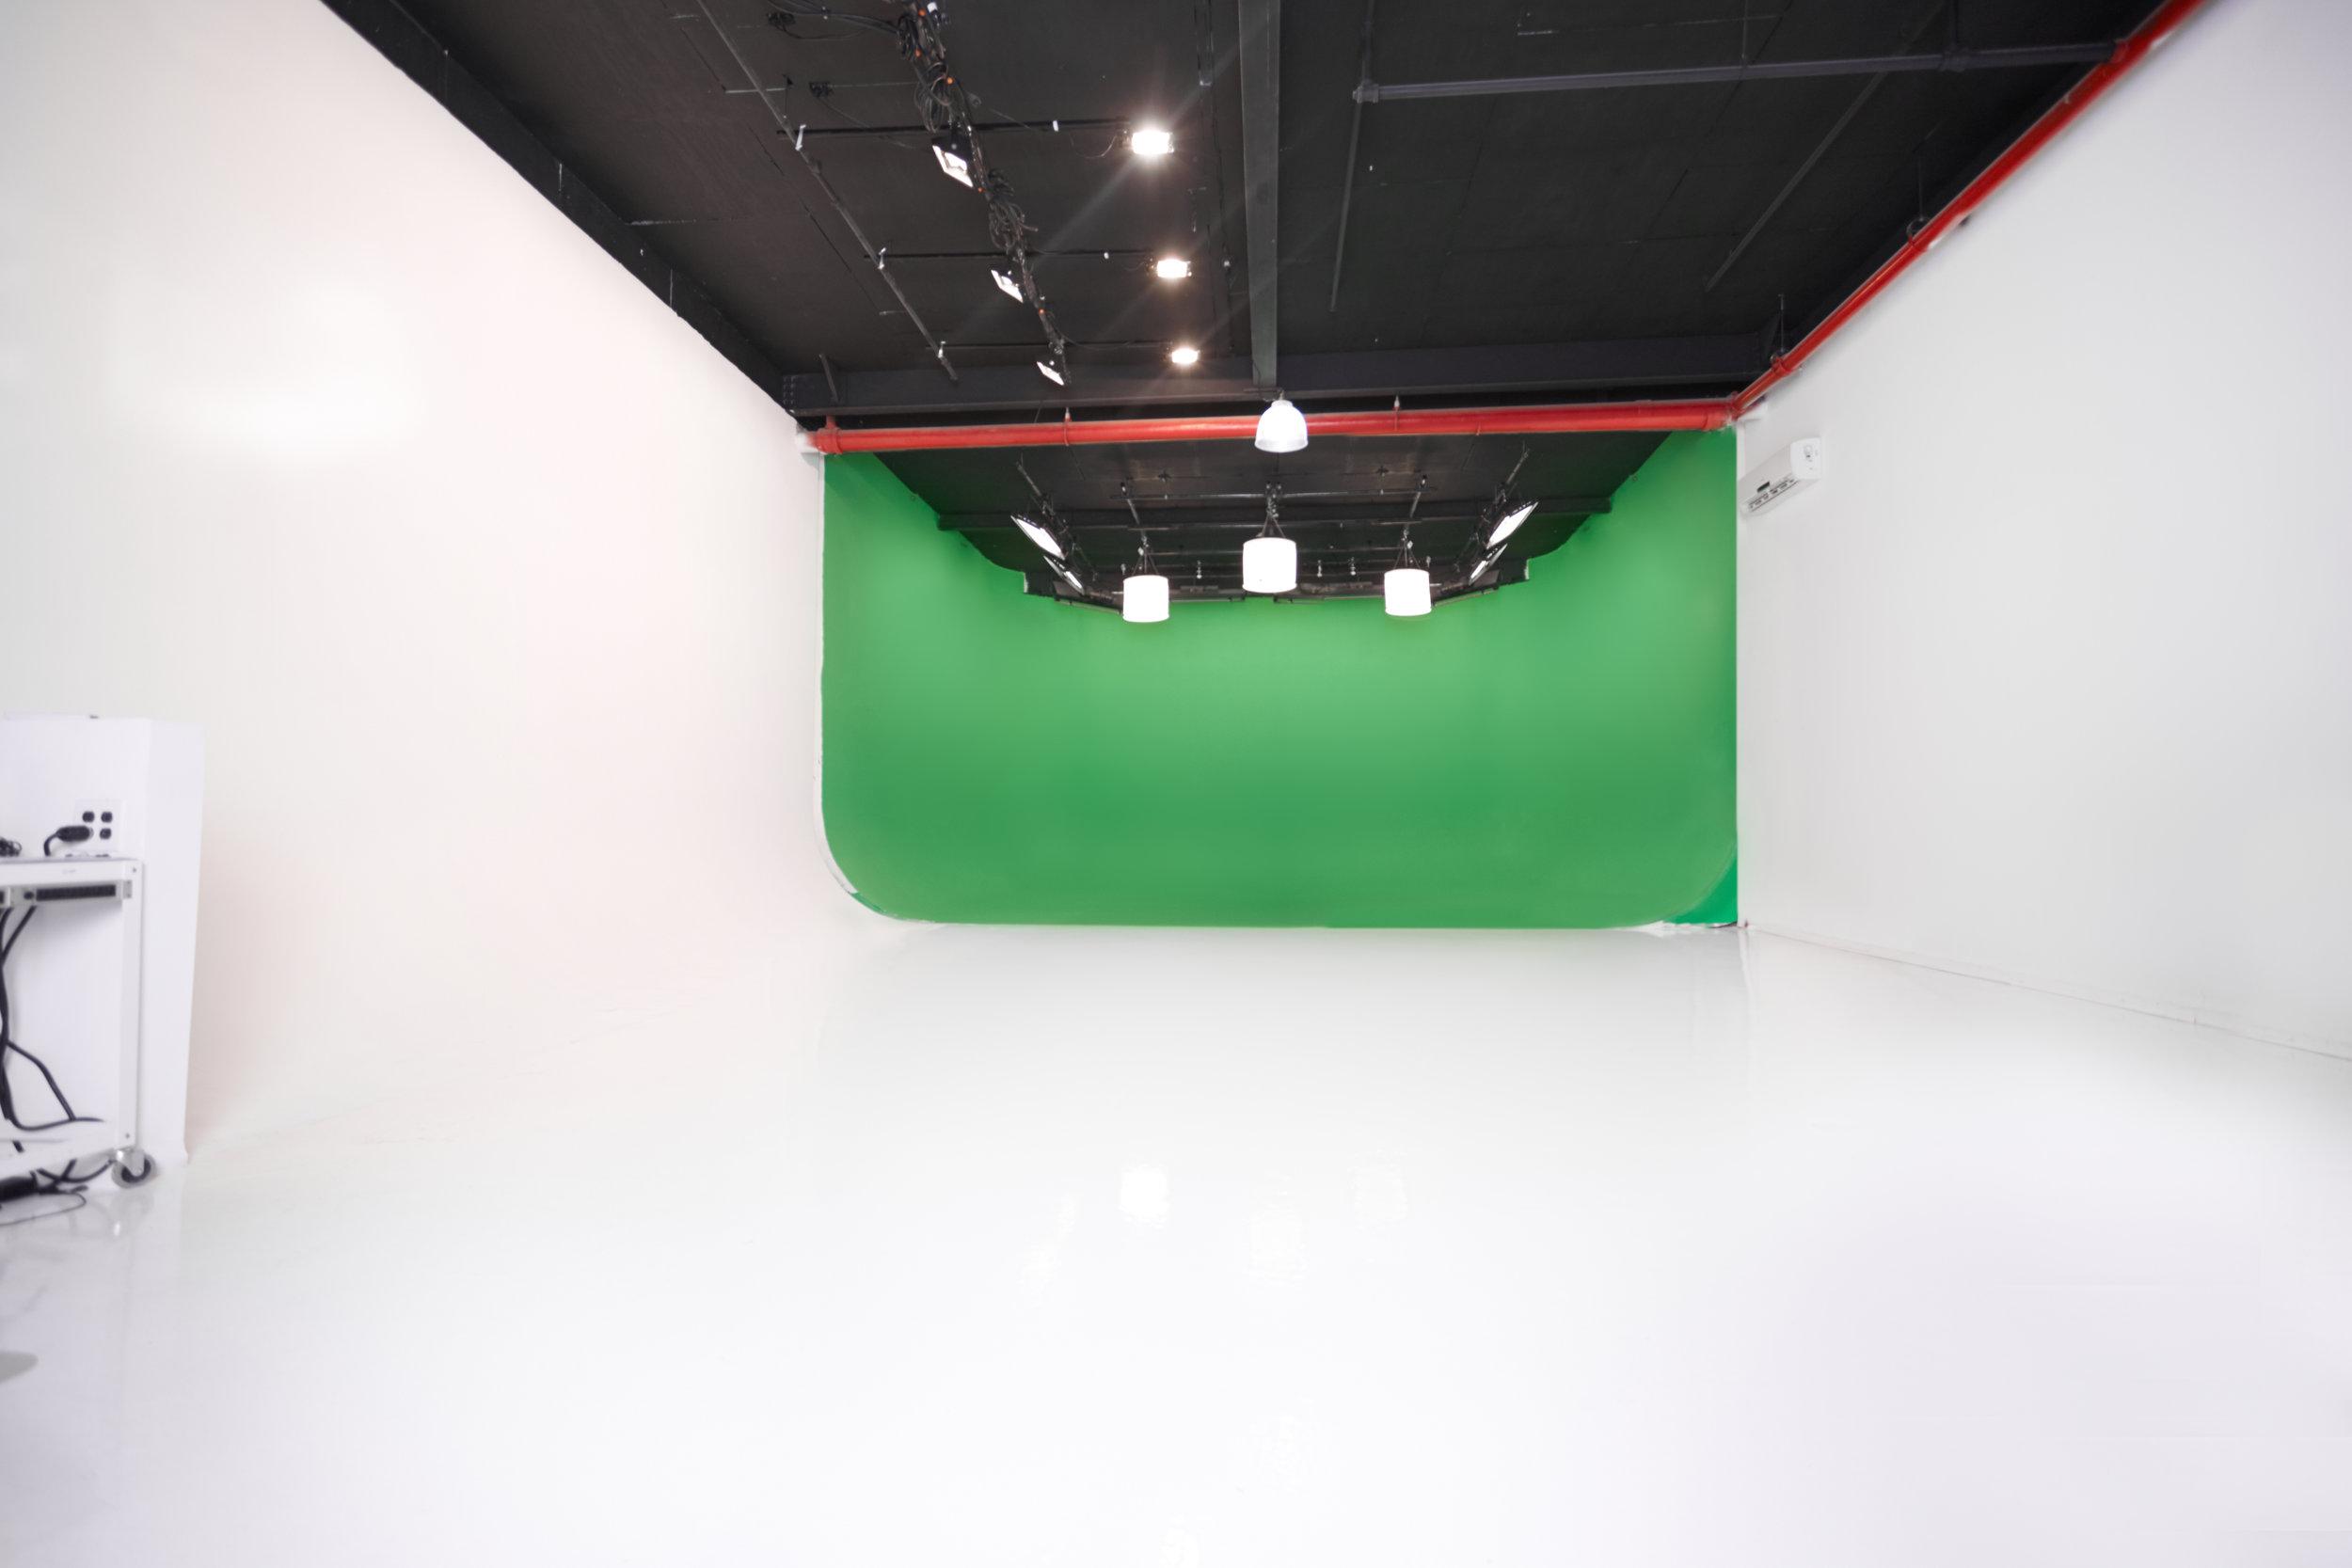 BMJ_Studios_greenscreen_cyc_stage.jpg